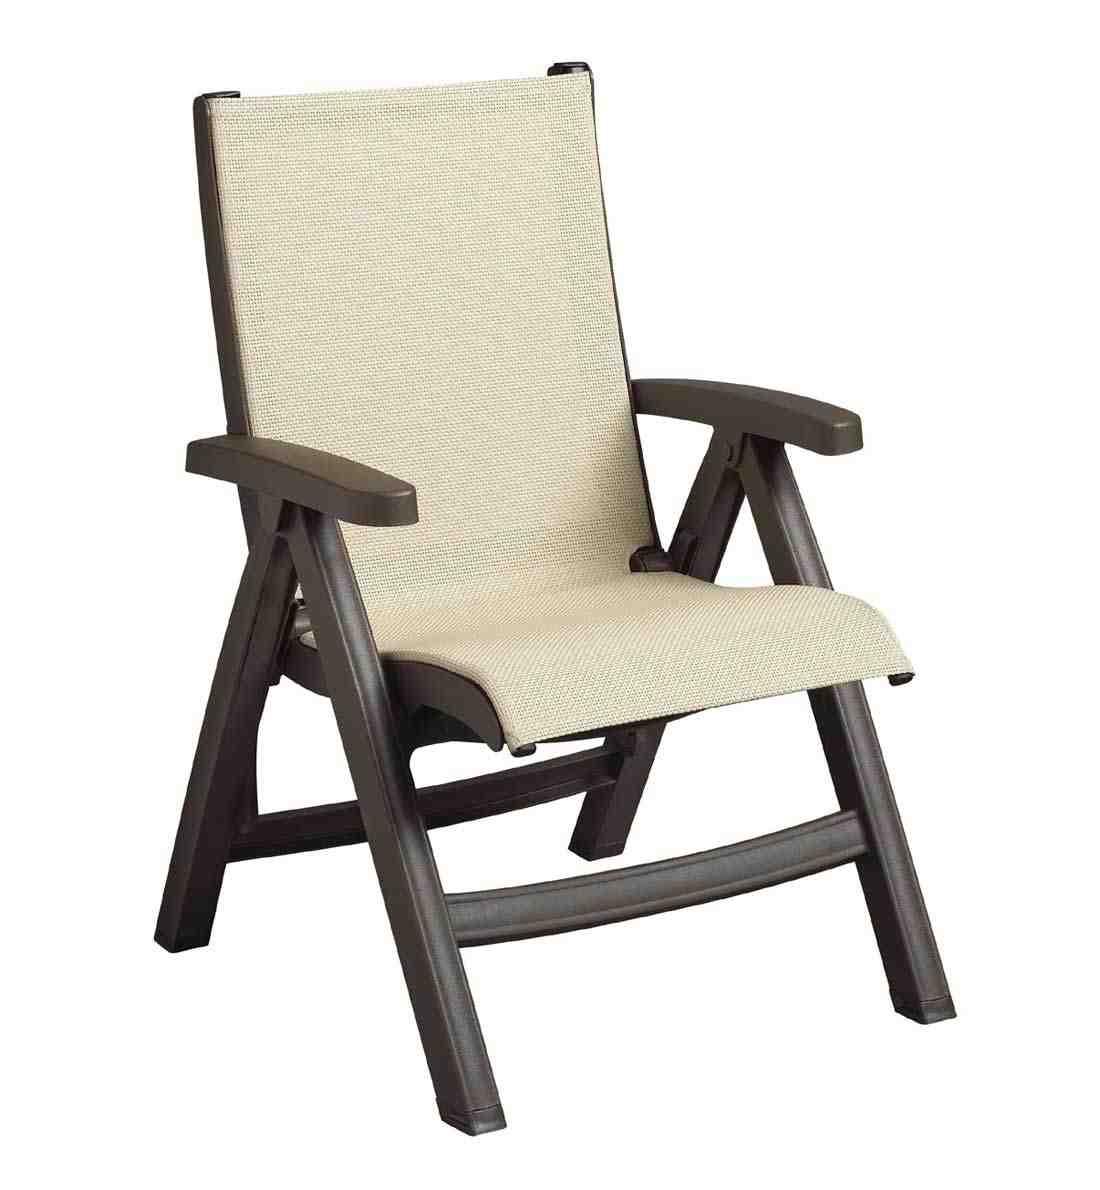 Best Outdoor Folding Chair  Home Furniture Design